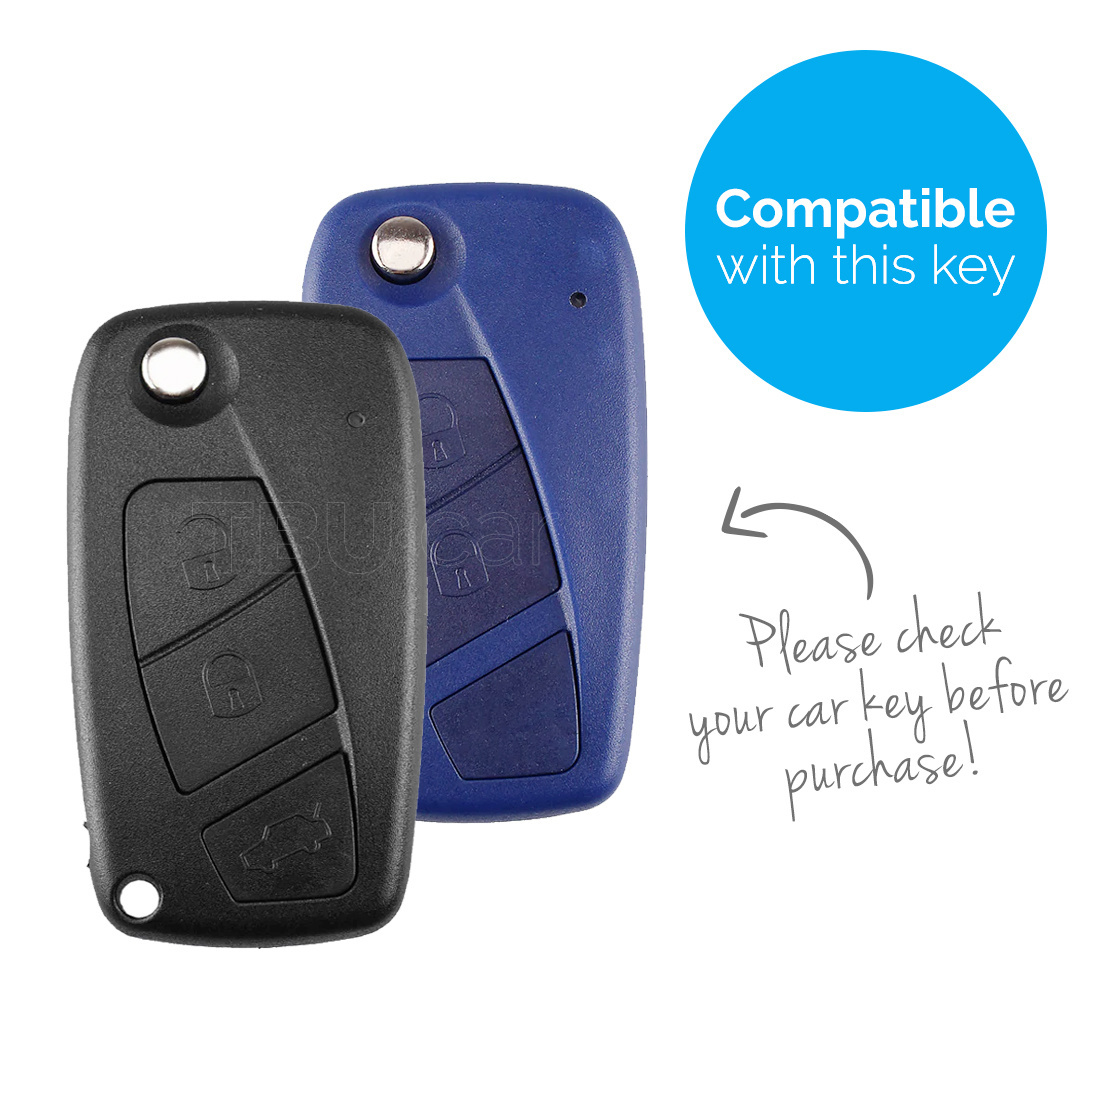 TBU car TBU car Autoschlüssel Hülle kompatibel mit Fiat 3 Tasten - Schutzhülle aus Silikon - Auto Schlüsselhülle Cover in Schwarz